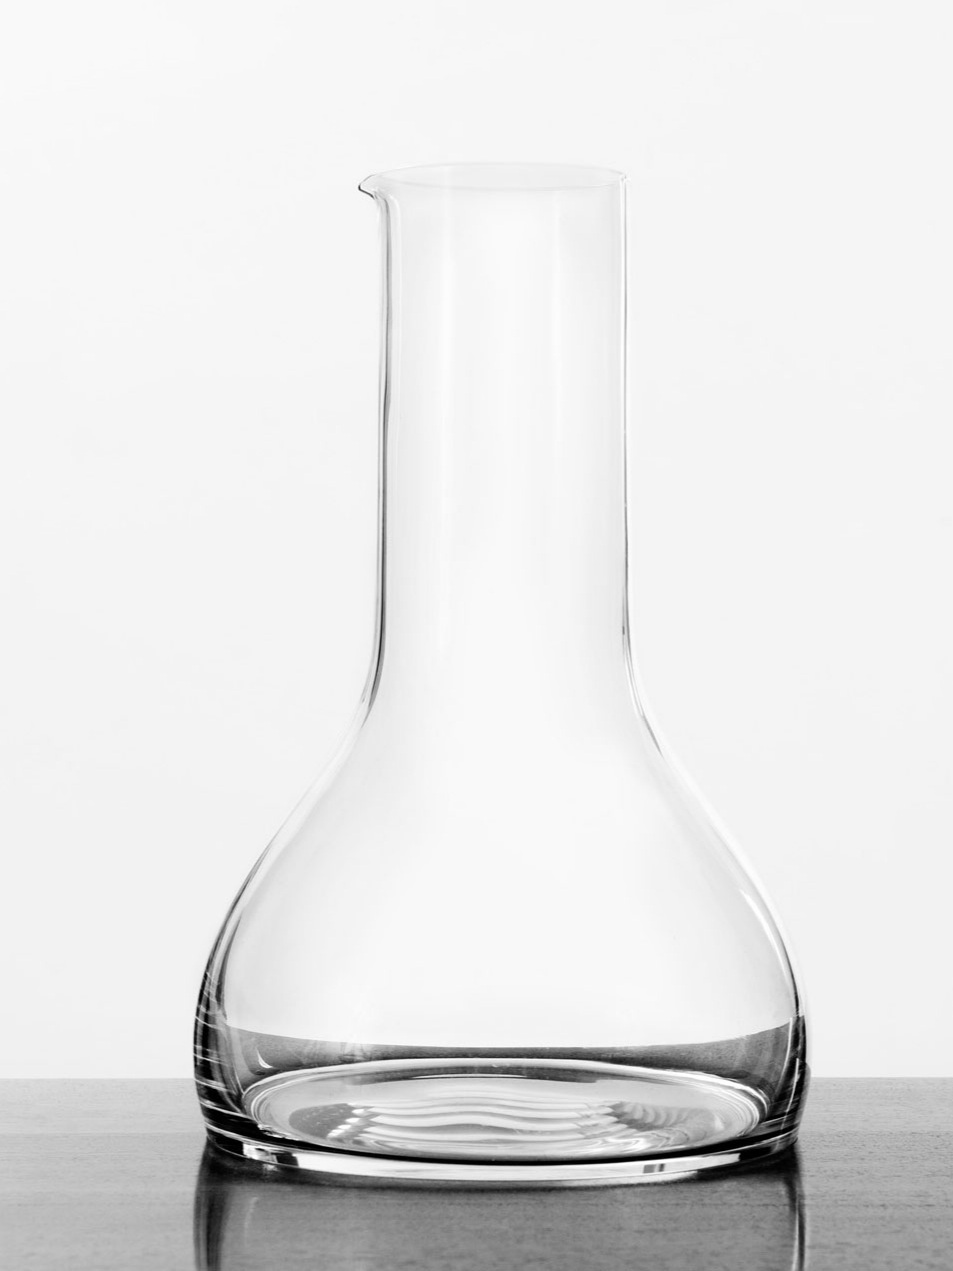 Water-decanter-by©Tora-Urup.jpg